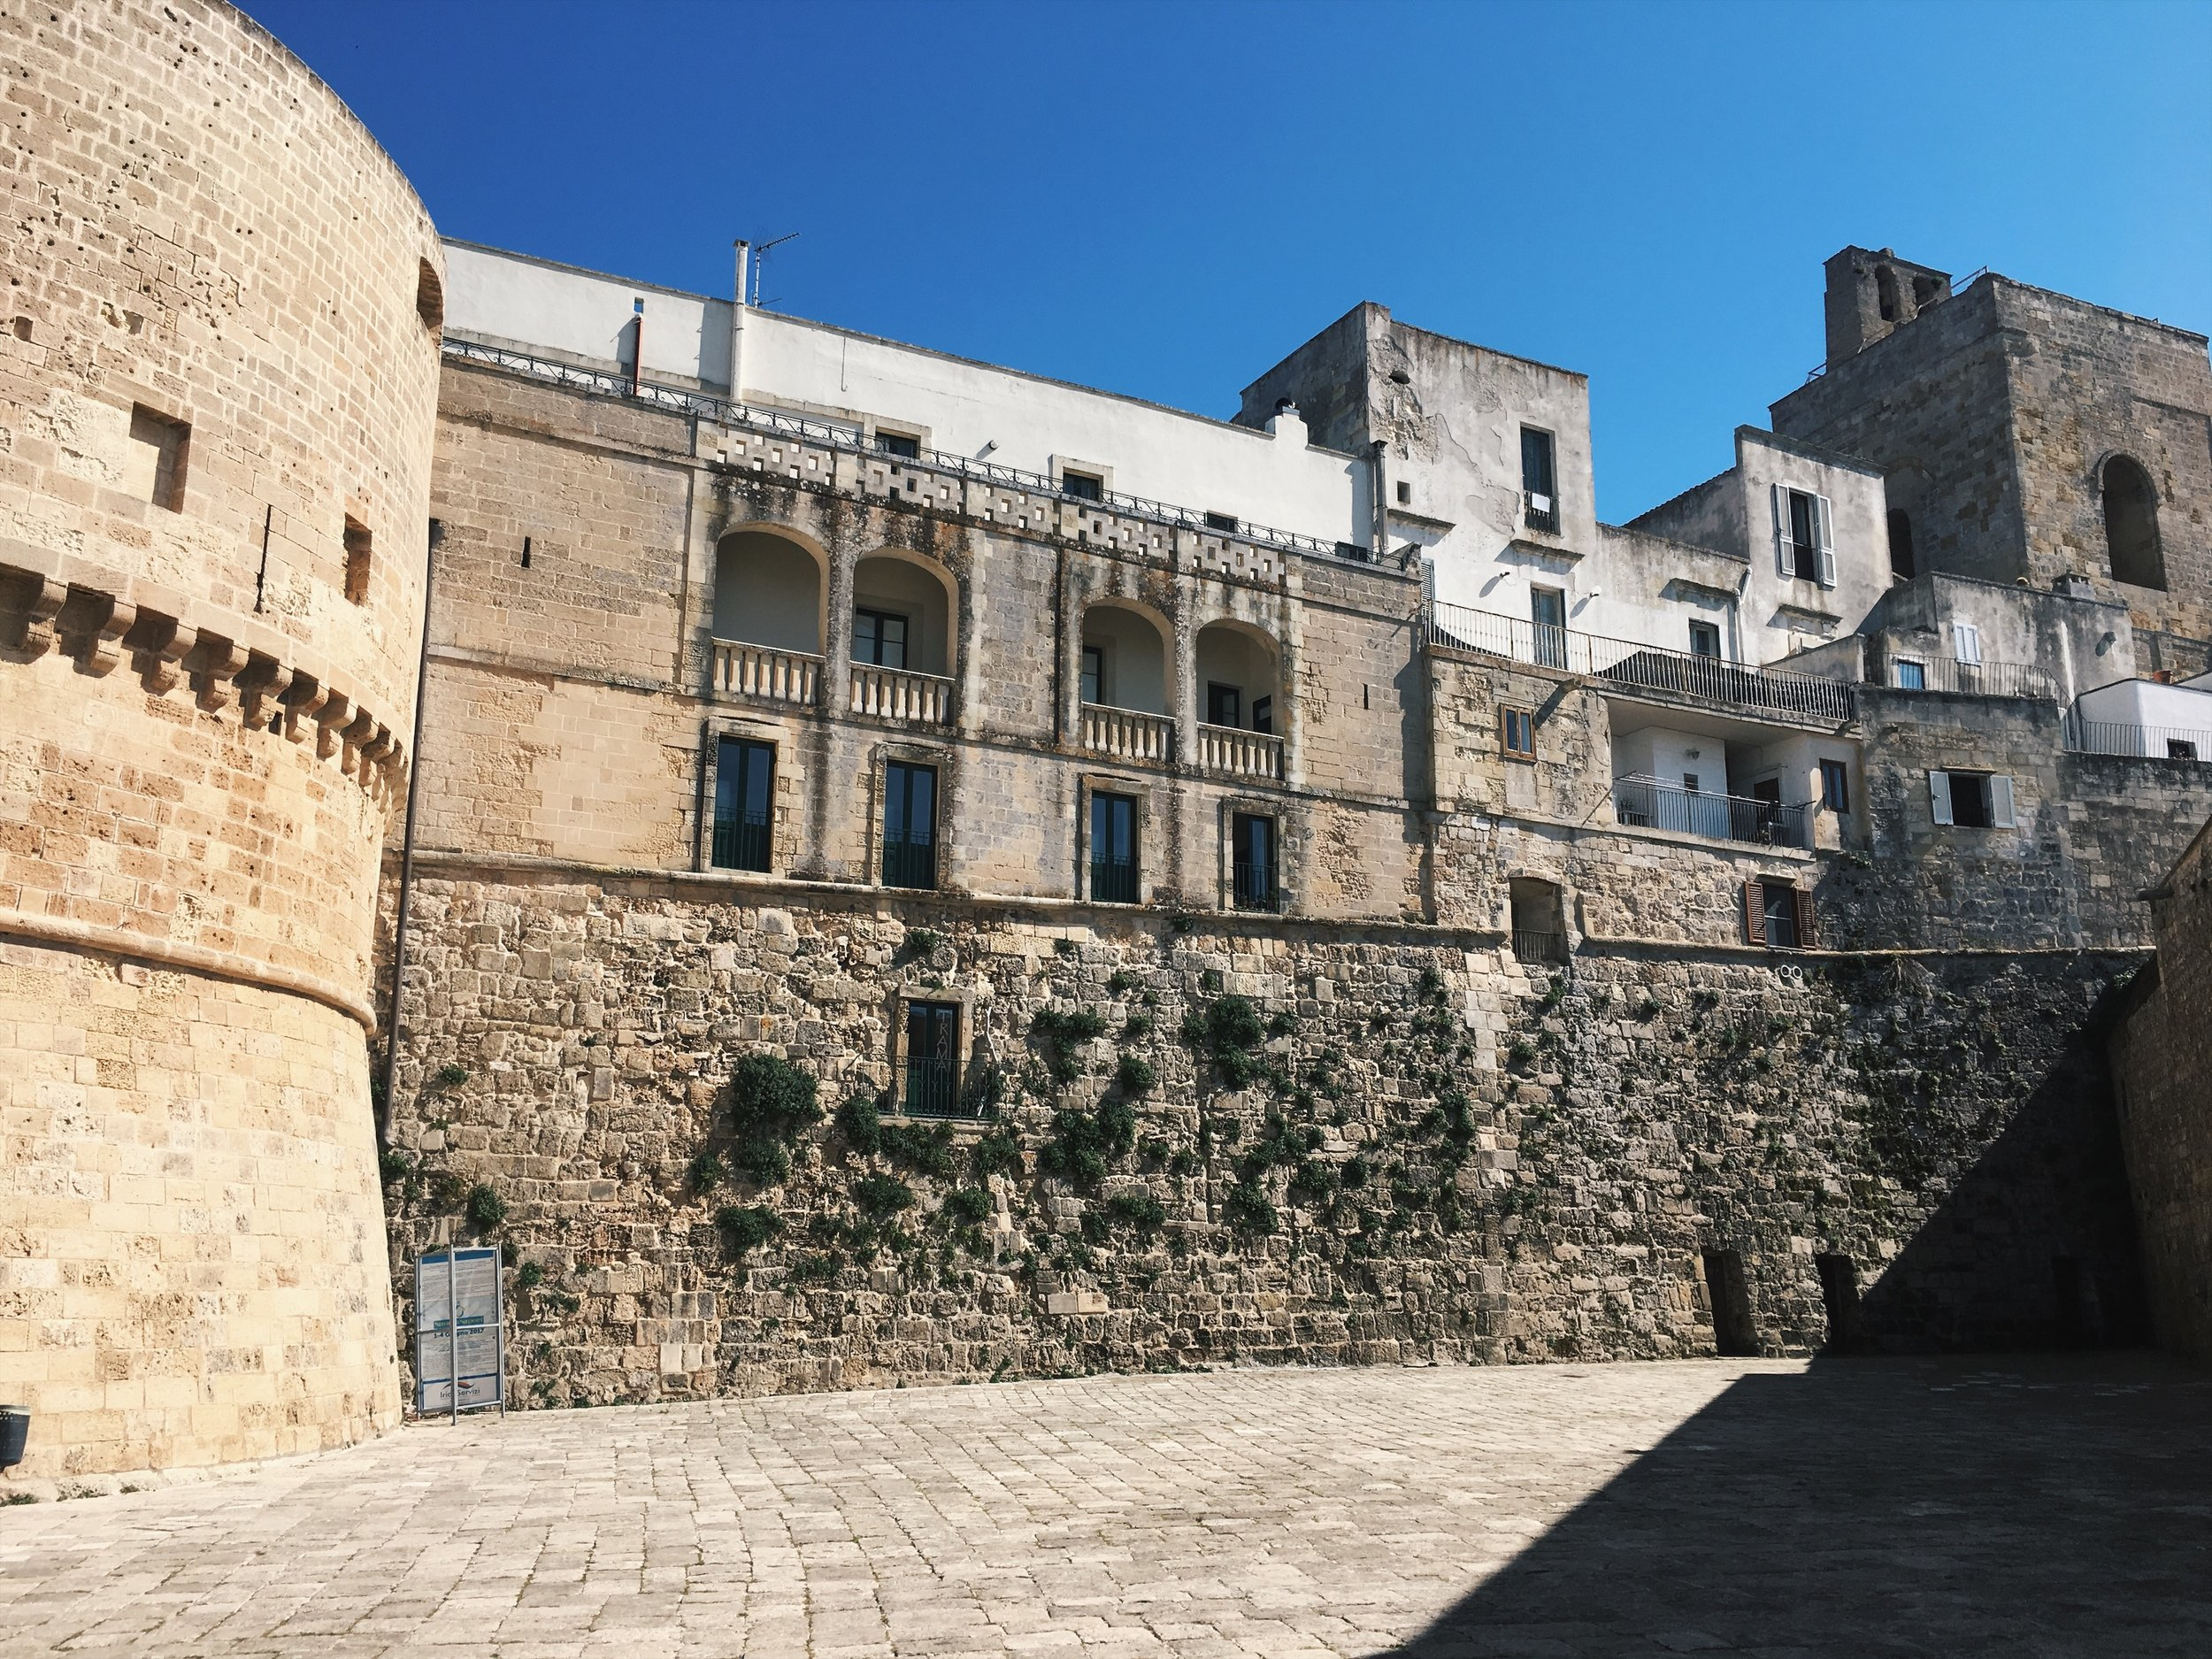 The Castle of Otranto Puglia 2019 Rory Mara The Attic on Eighth.JPG